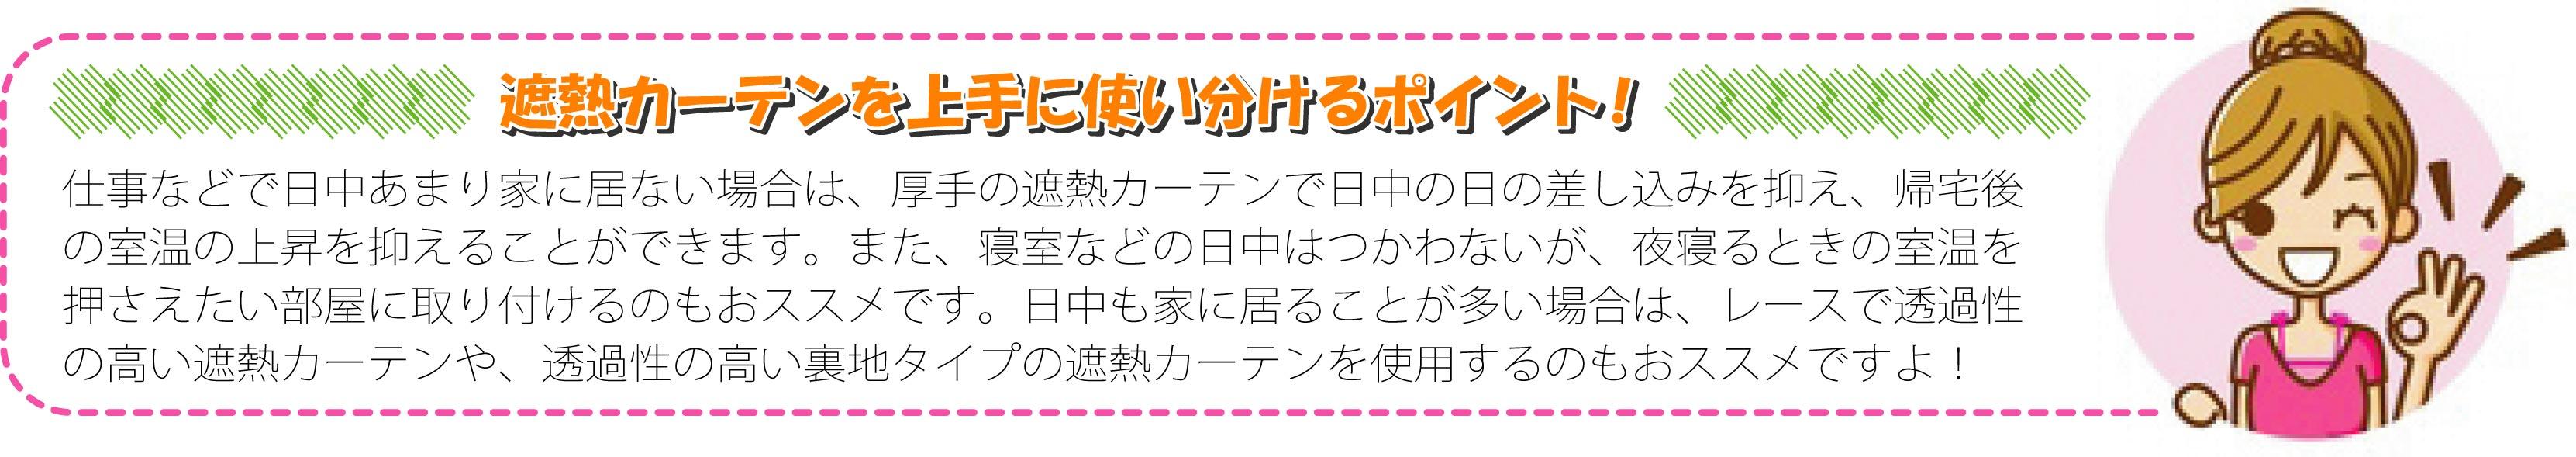 KuraSi-natu-sin75-12.jpg